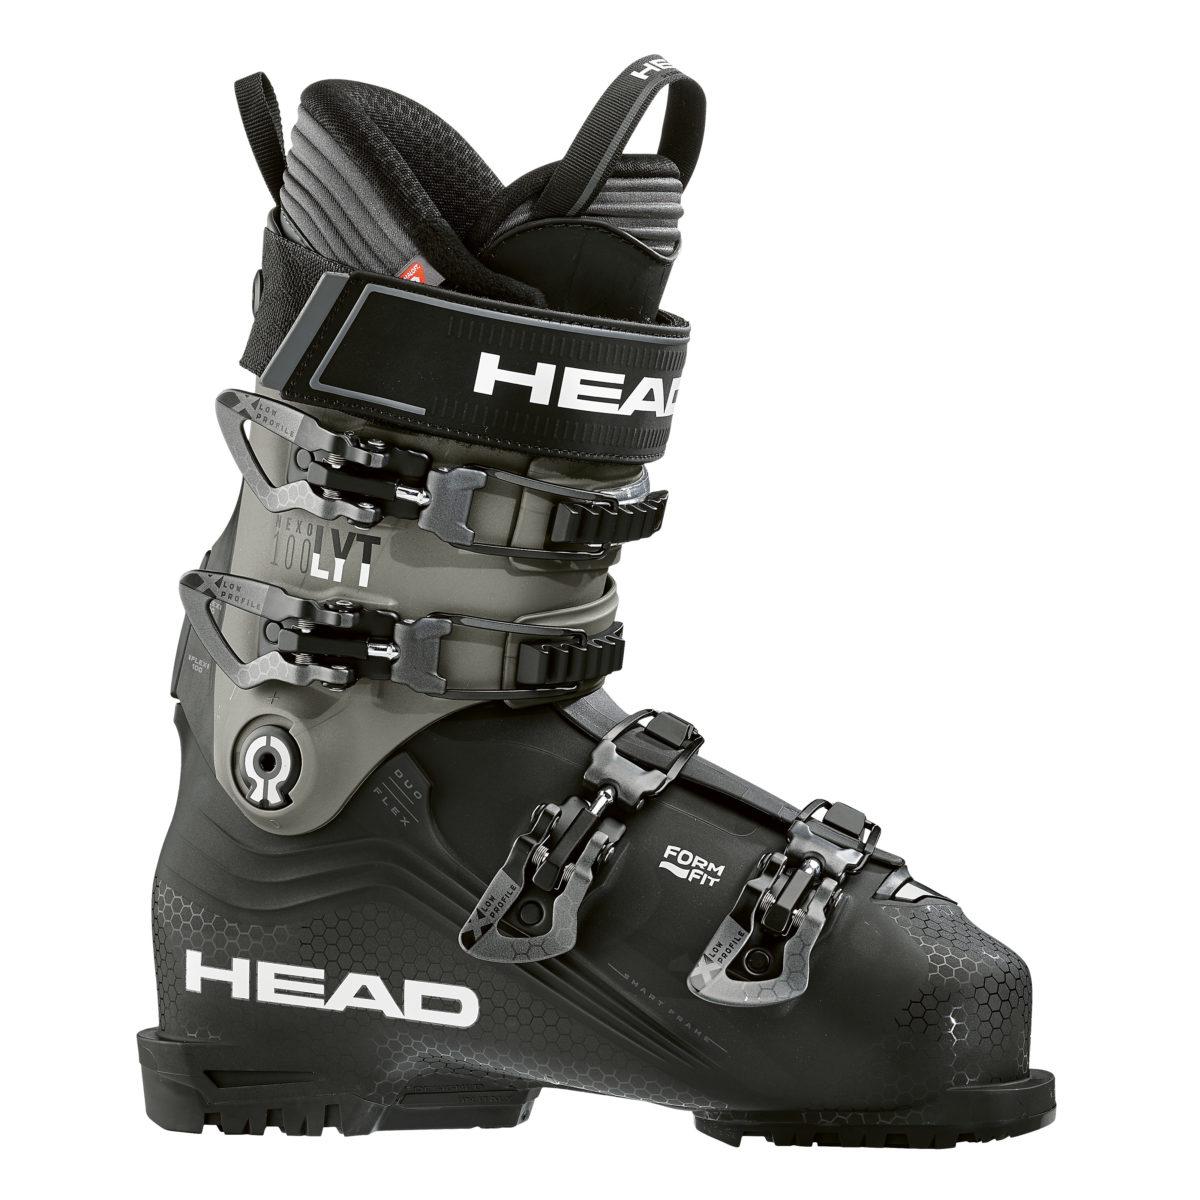 HEAD NEXO LYT 100 Ботинки горнолыжные 609165 - 1